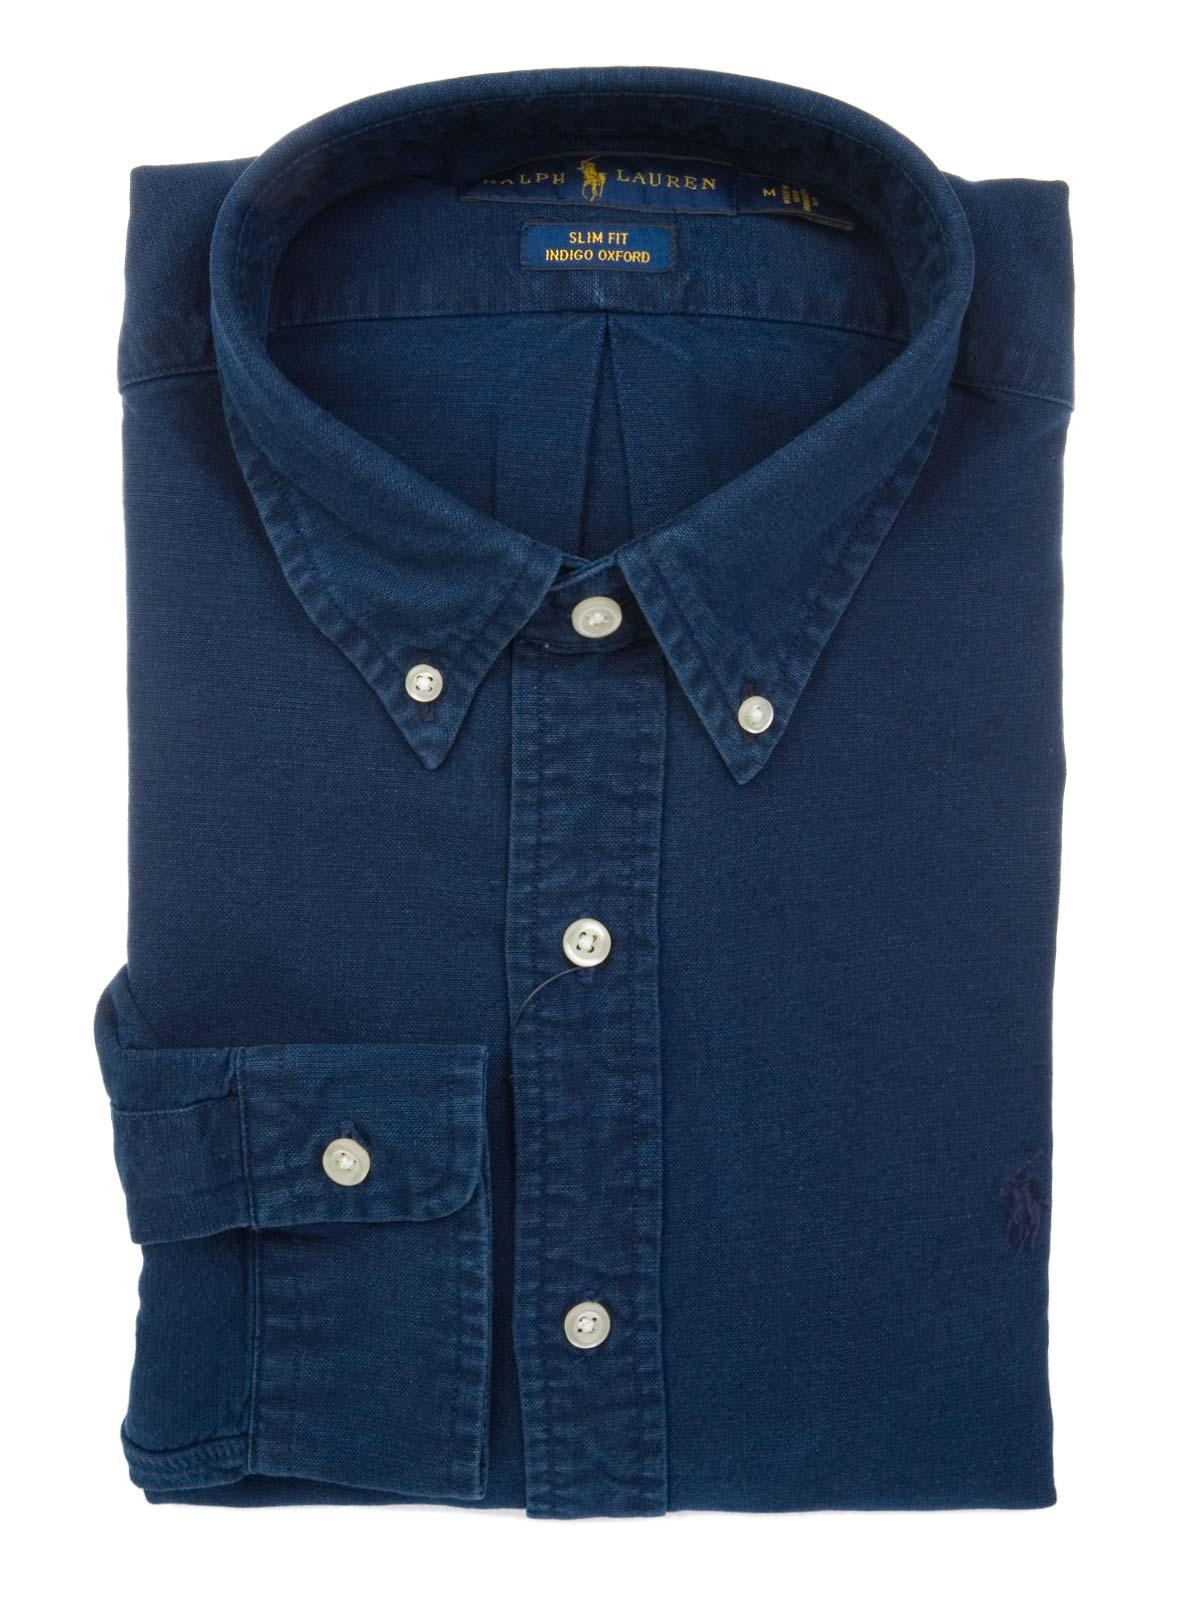 7c752ef8a RALPH LAUREN Indigo Oxford Shirt | 710672877005 | Botta & B Online Store